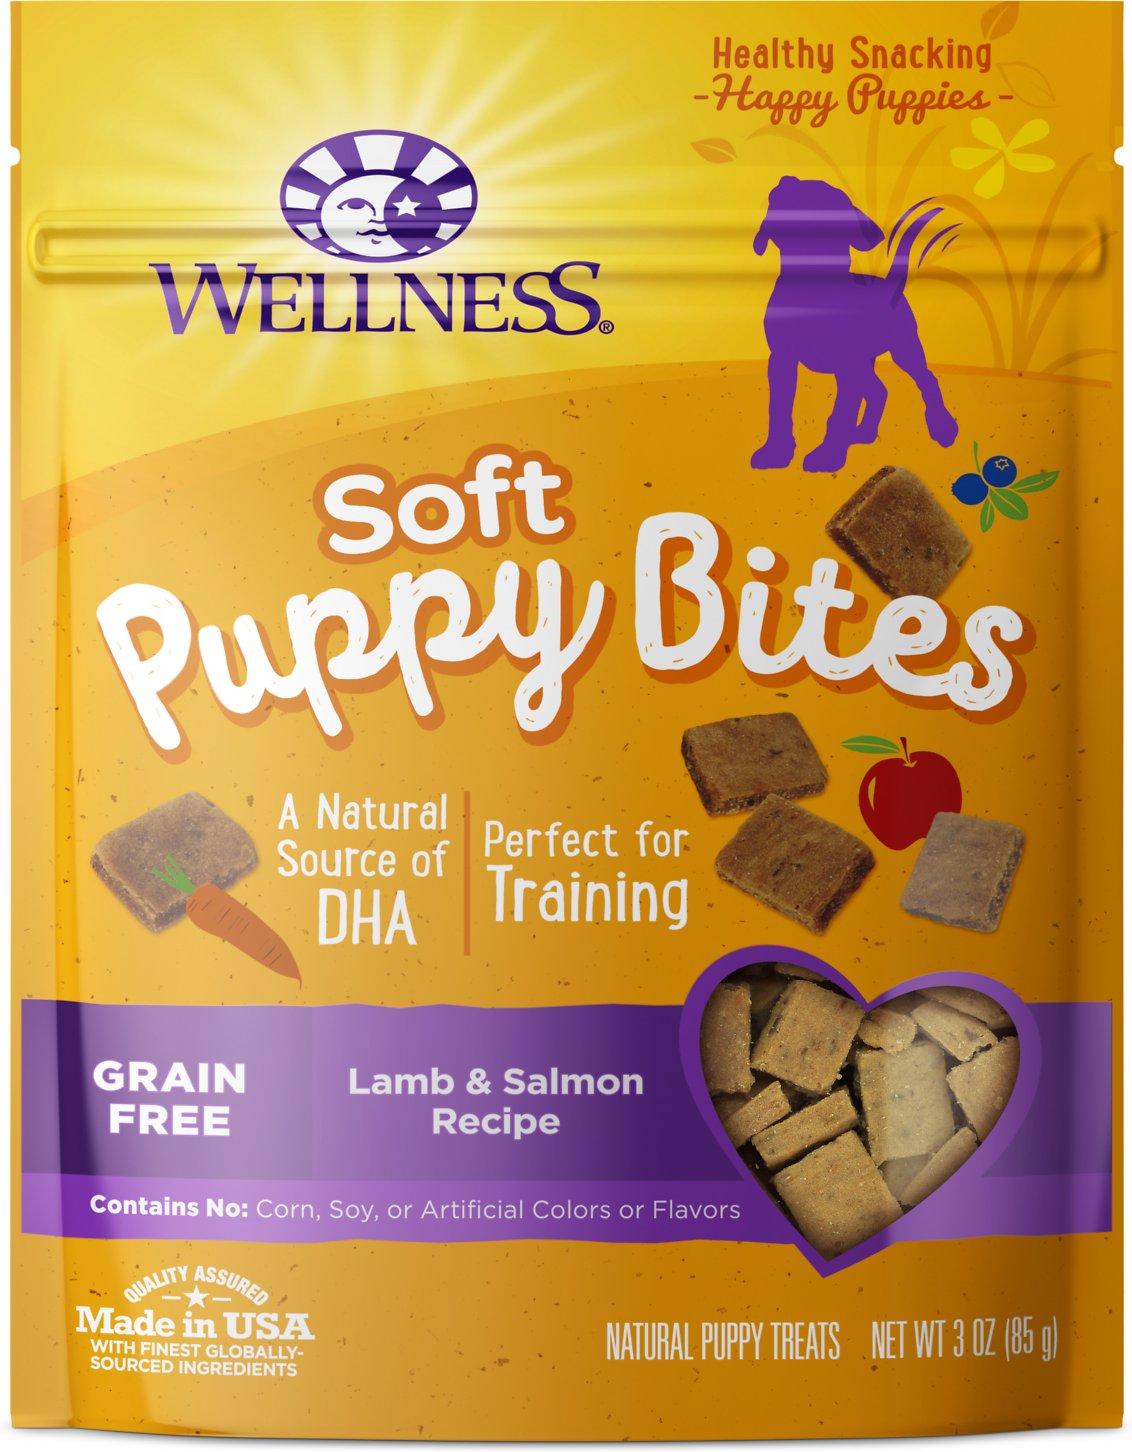 Wellness Soft Puppy Bites Grain-Free Lamb & Salmon Recipe Dog Treats, 3-oz (Weights: 3.52ounces) Image